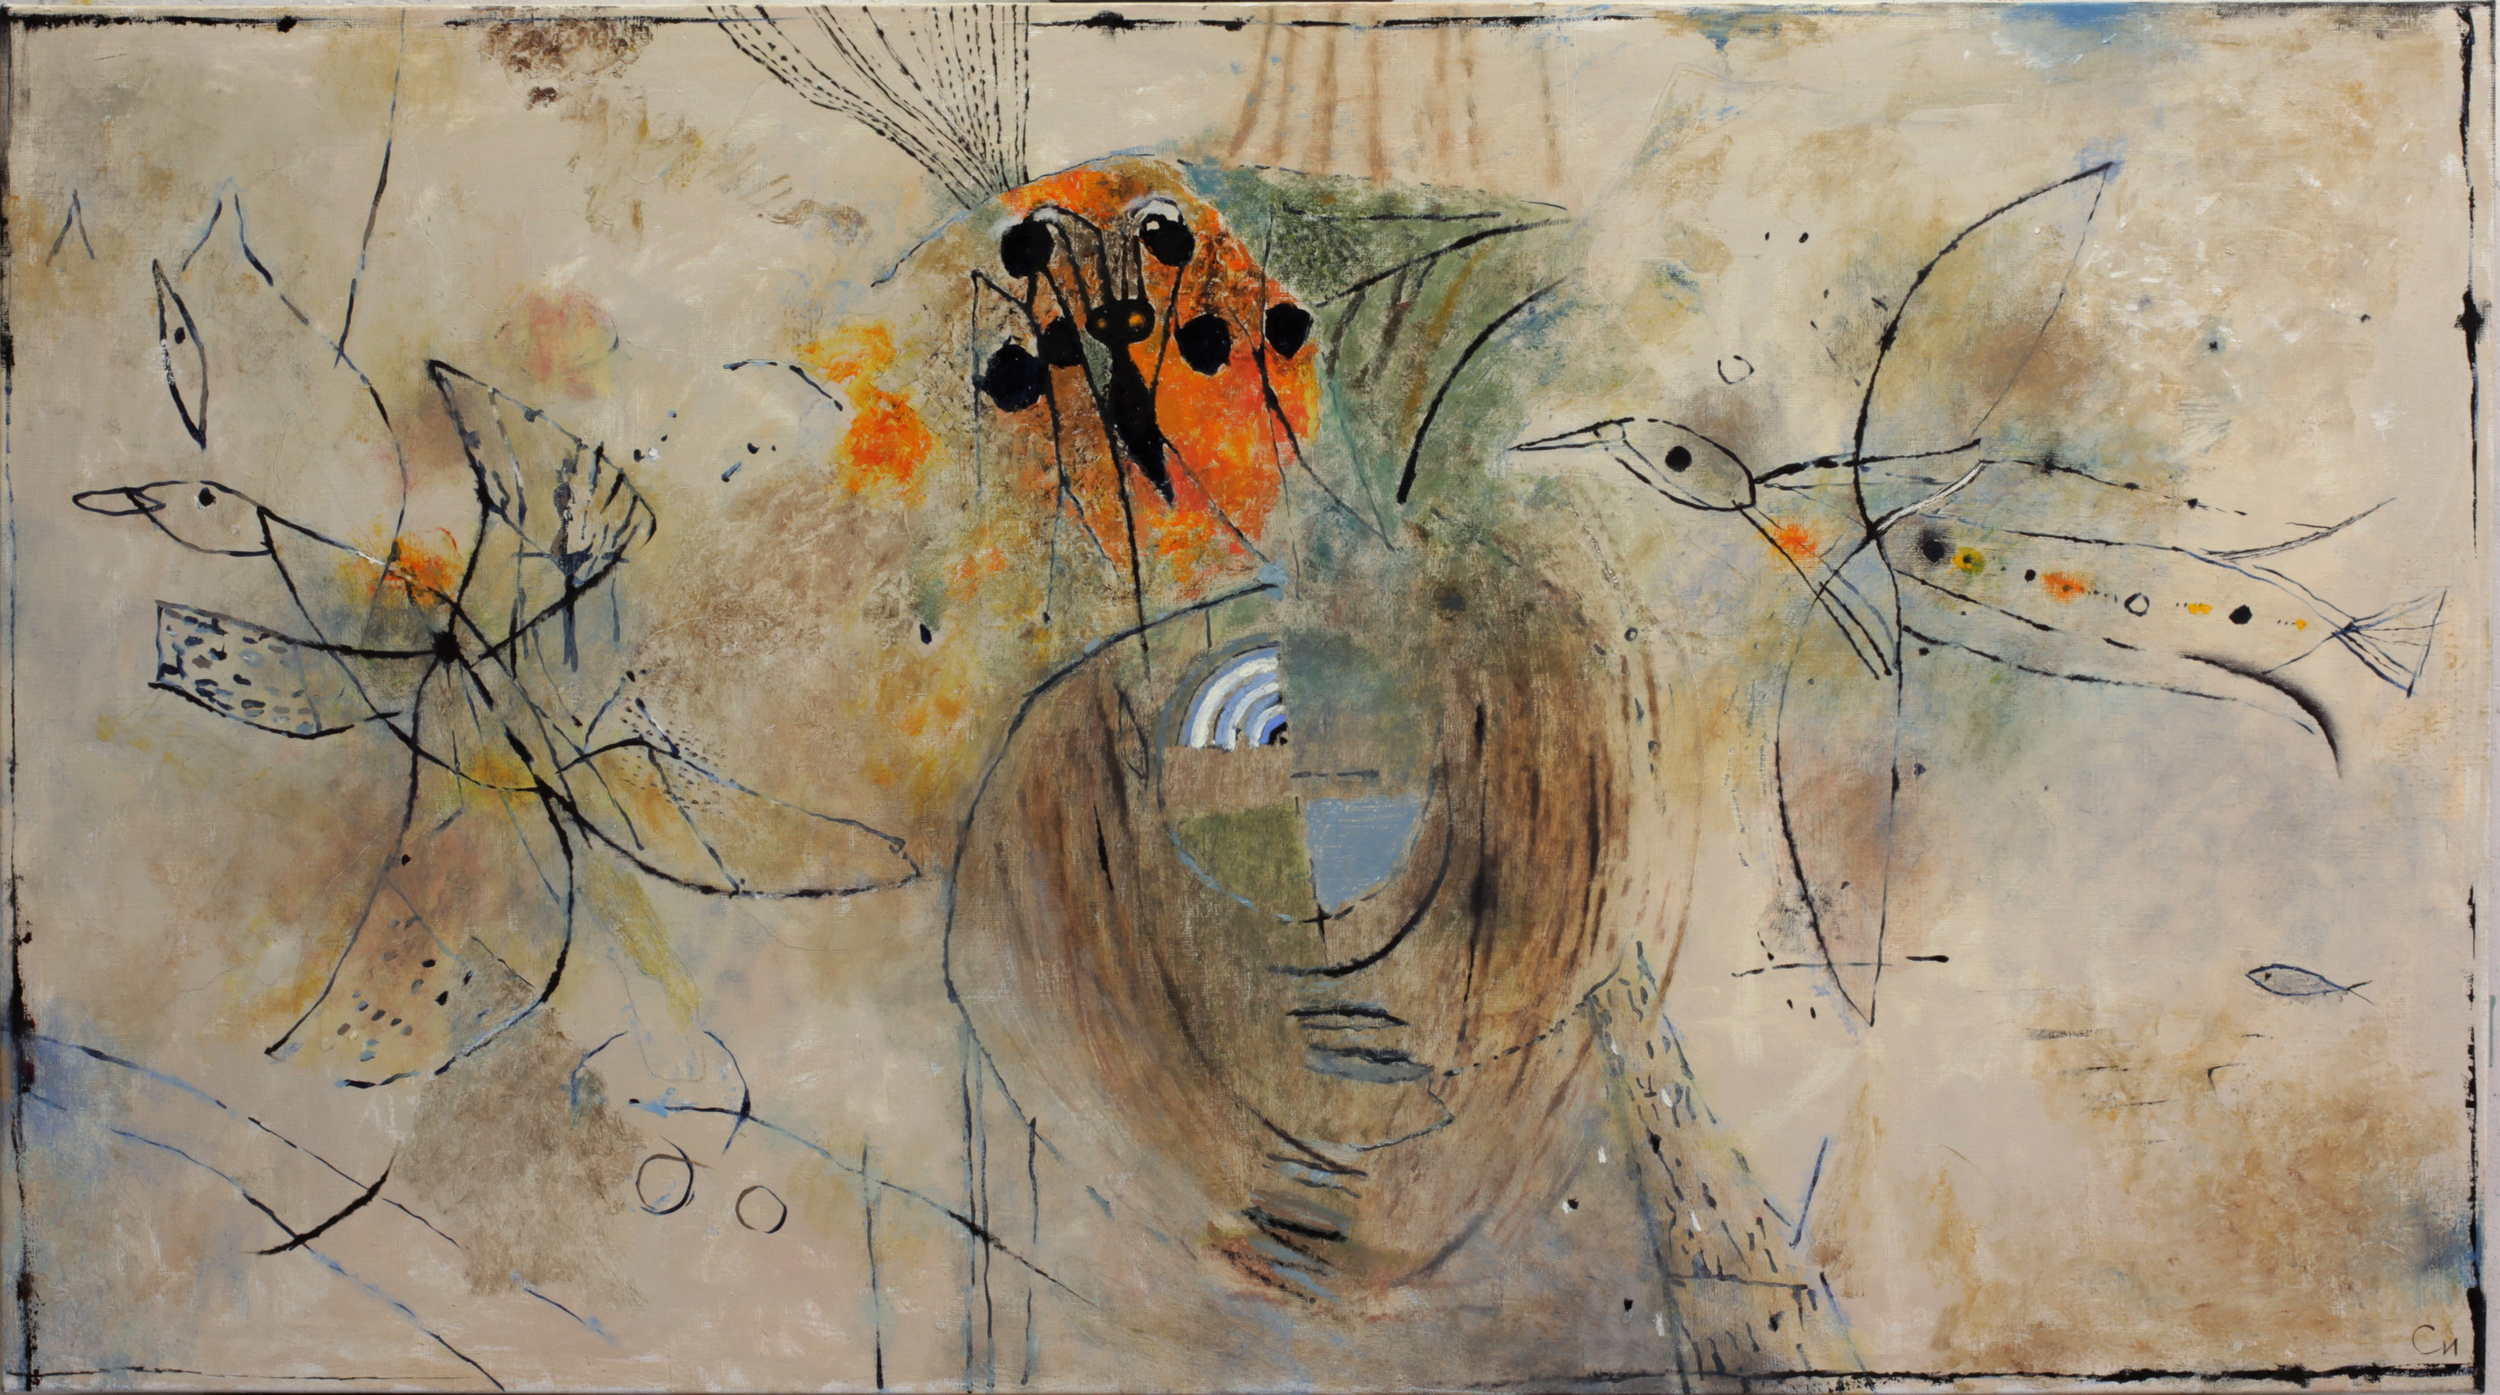 Creating flight, 2015, Oil on Canvas, 30 x 53 in (75 х 135 cm)